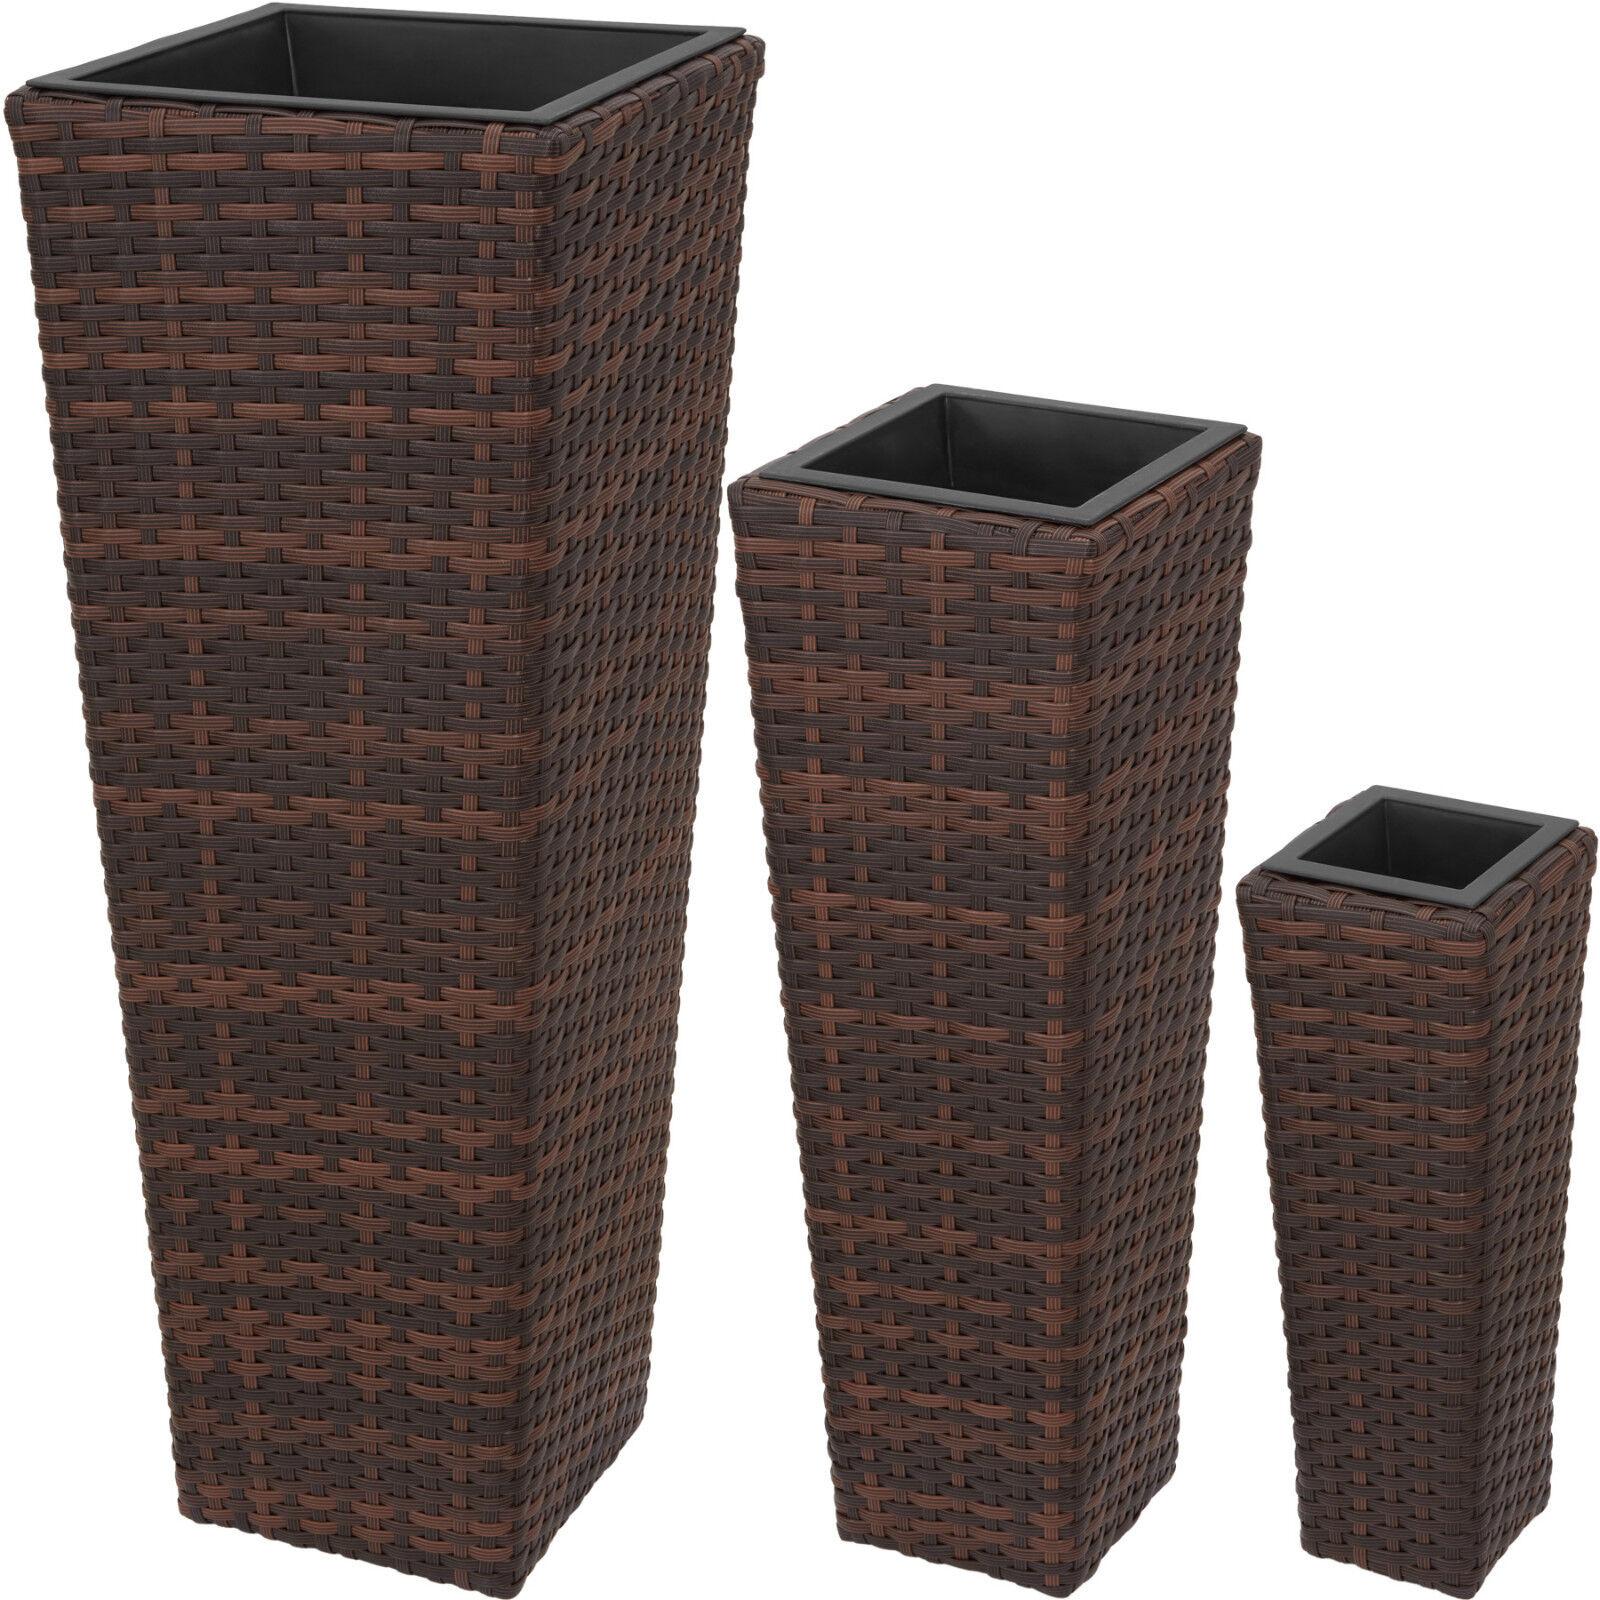 Set di 3 vasi polyrattan giardino casa balcone arrojoo rattan vaso mixed-marrón